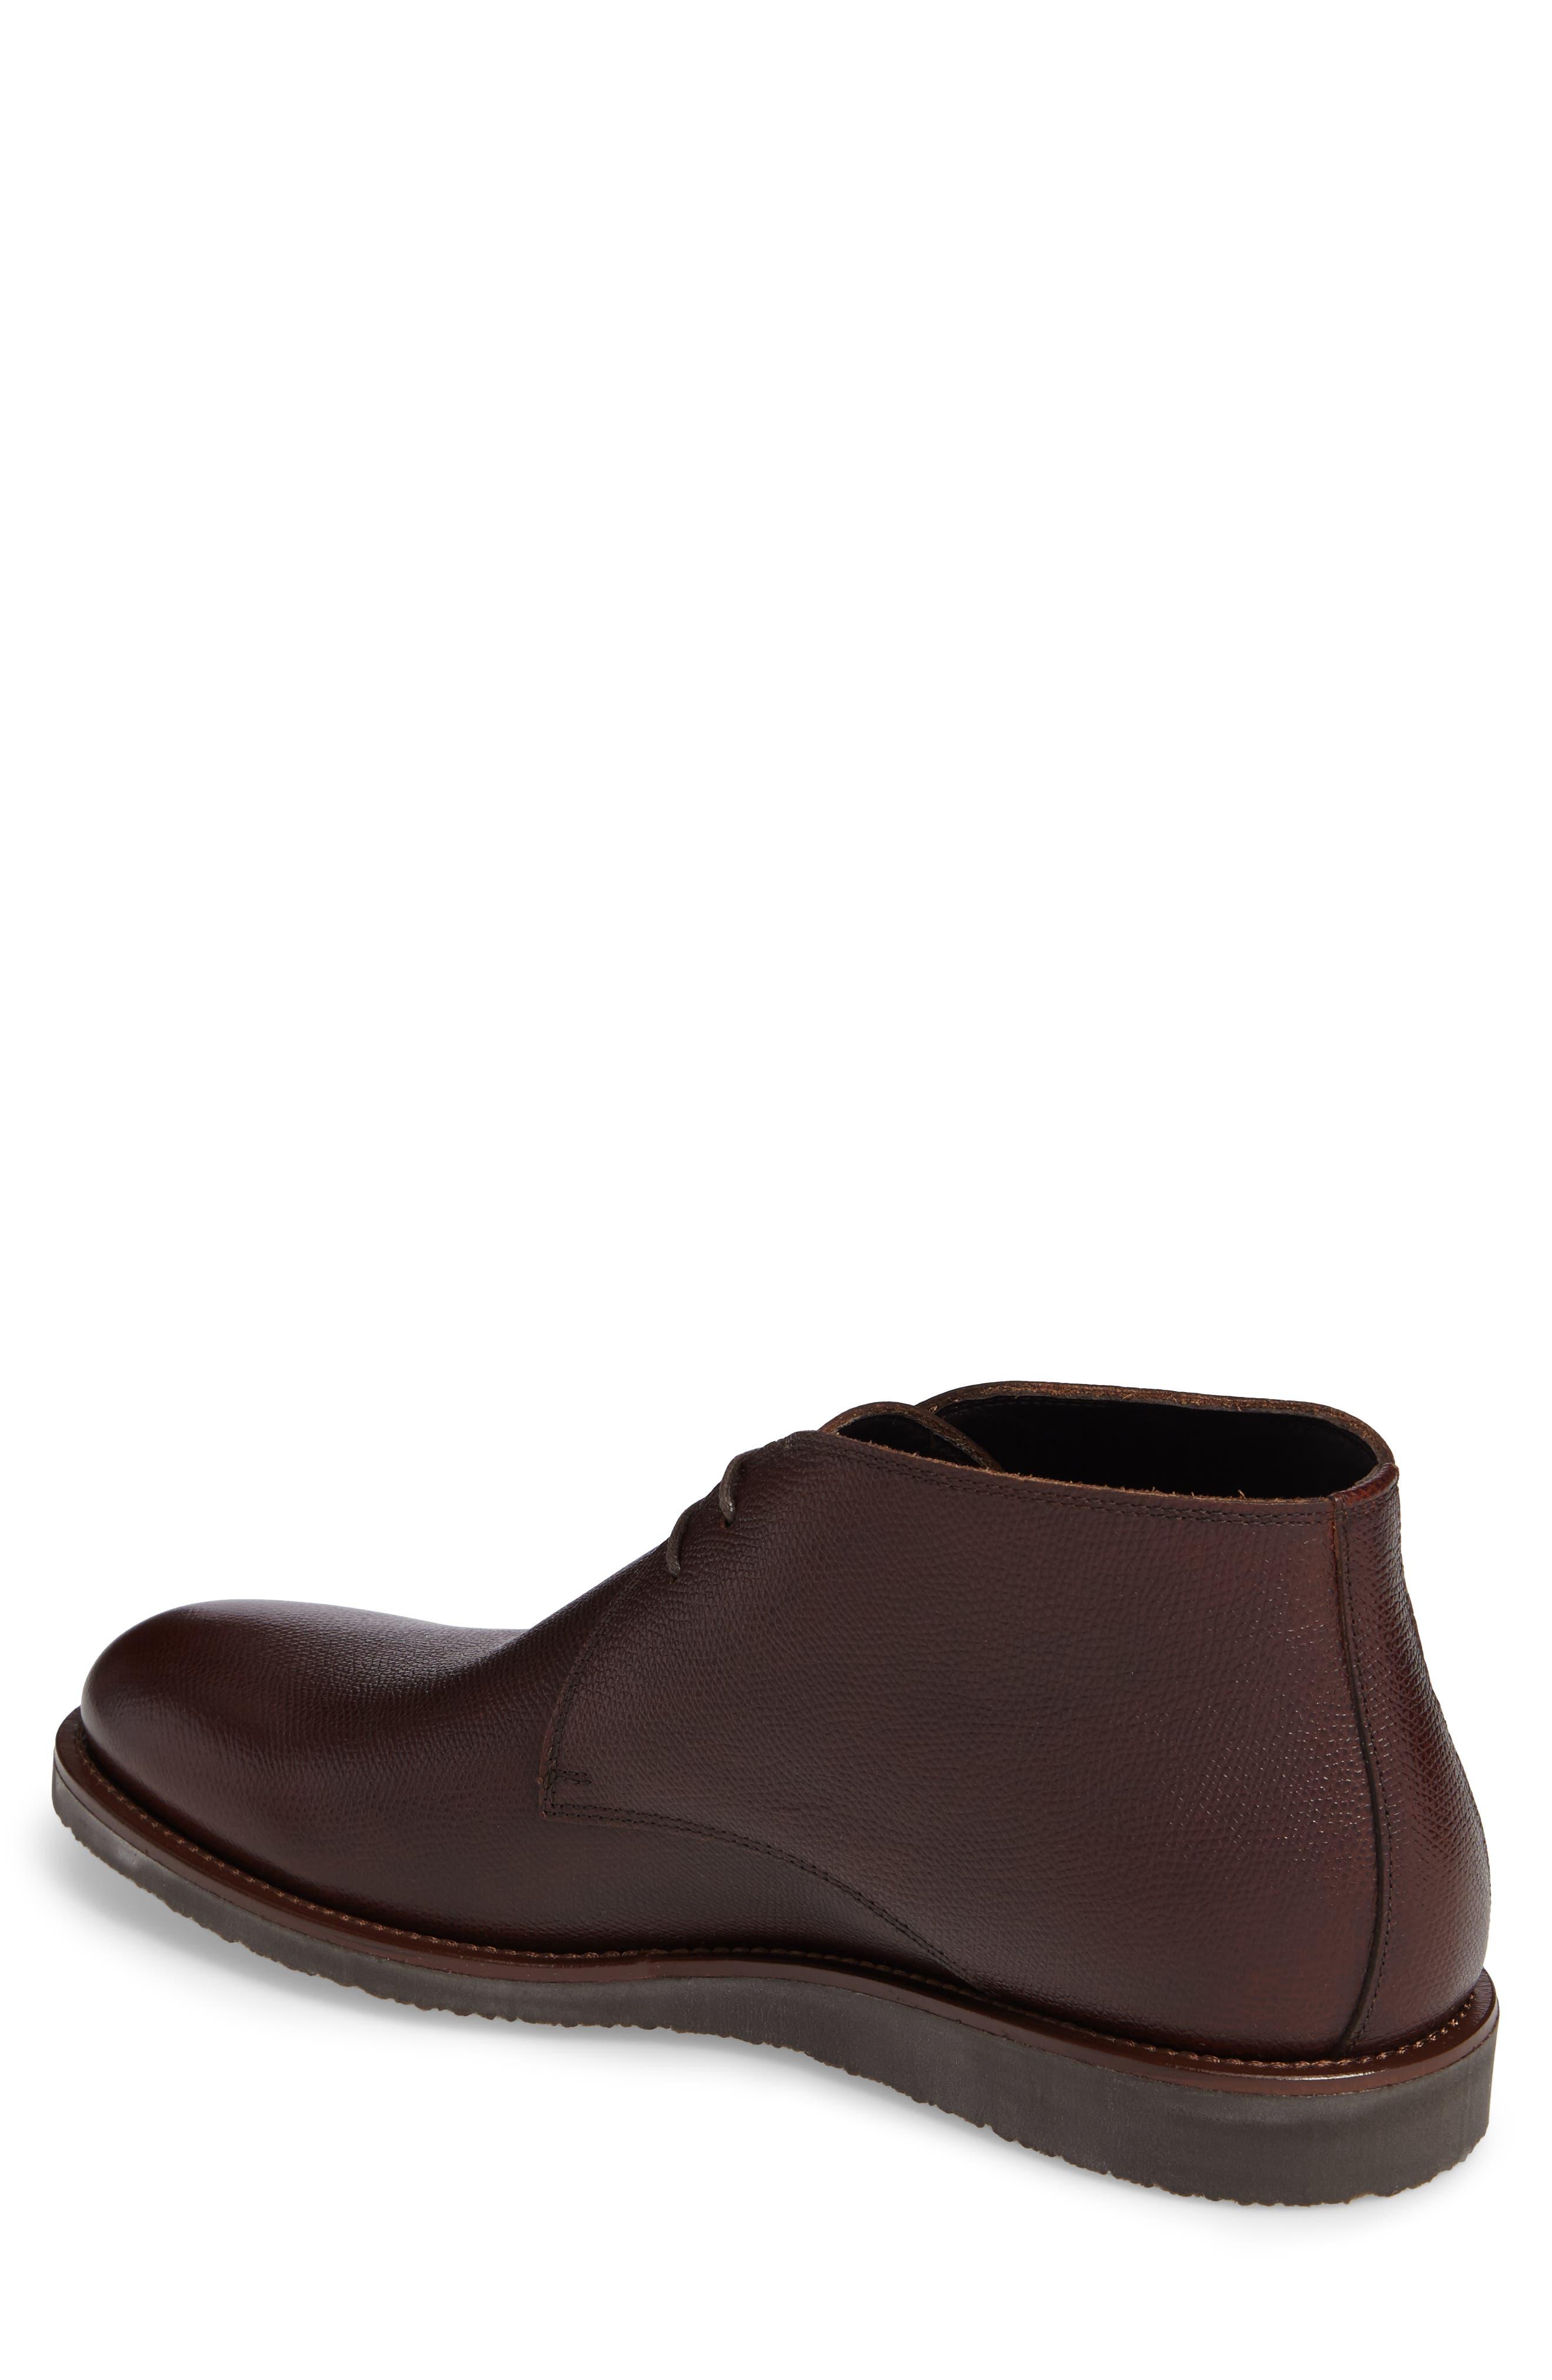 Alternate Image 2  - To Boot New York Franklin Chukka Boot (Men)